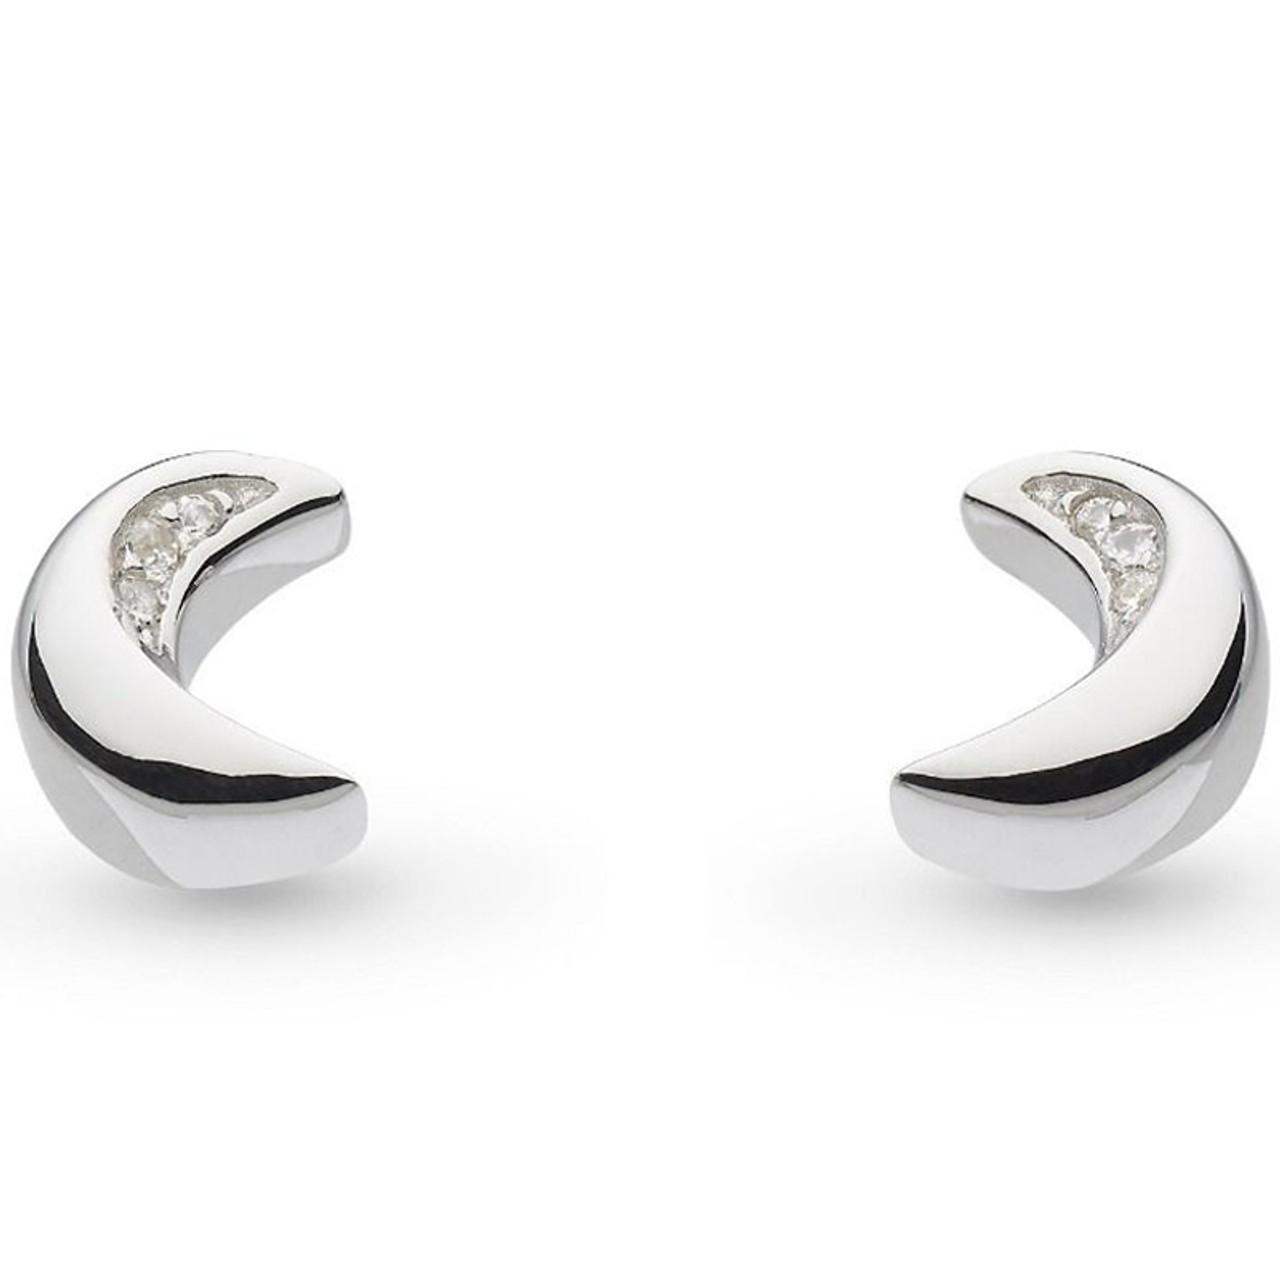 b1444ccc615a1 Kit Heath Ladies Silver Miniature Sparkle Cubic Zirconia Mini Moon Stud  Earrings 40035CZ027